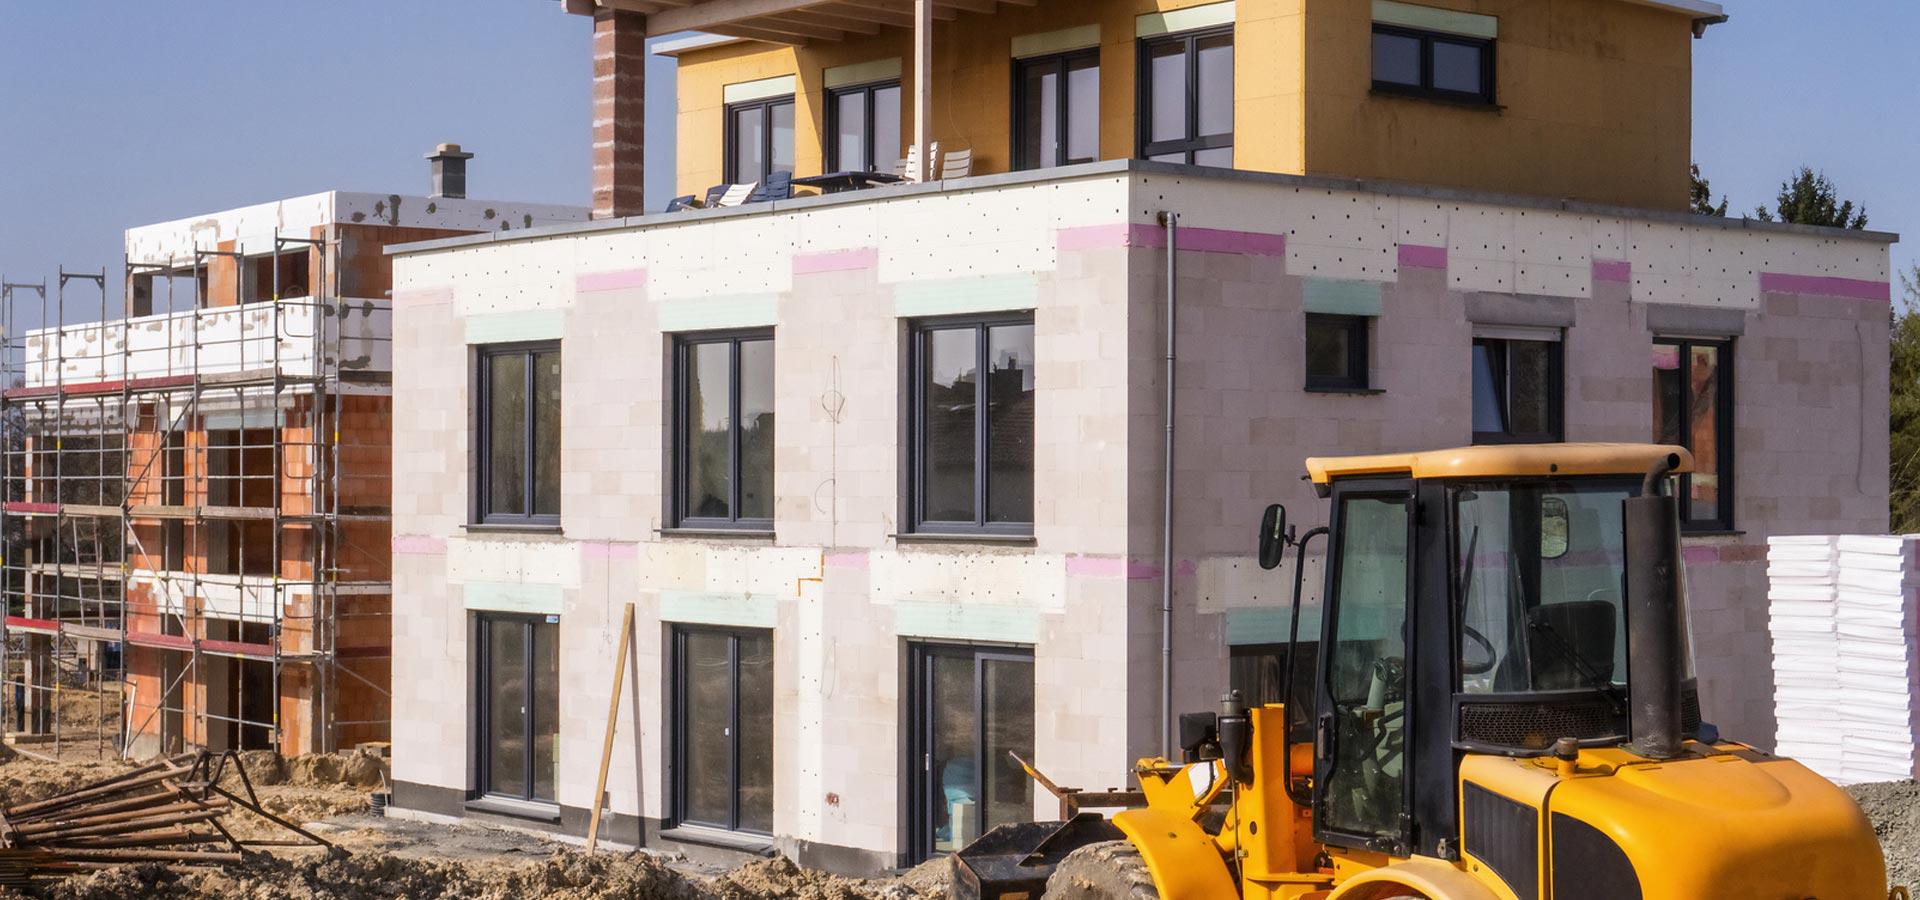 Selling a house in Dreieich